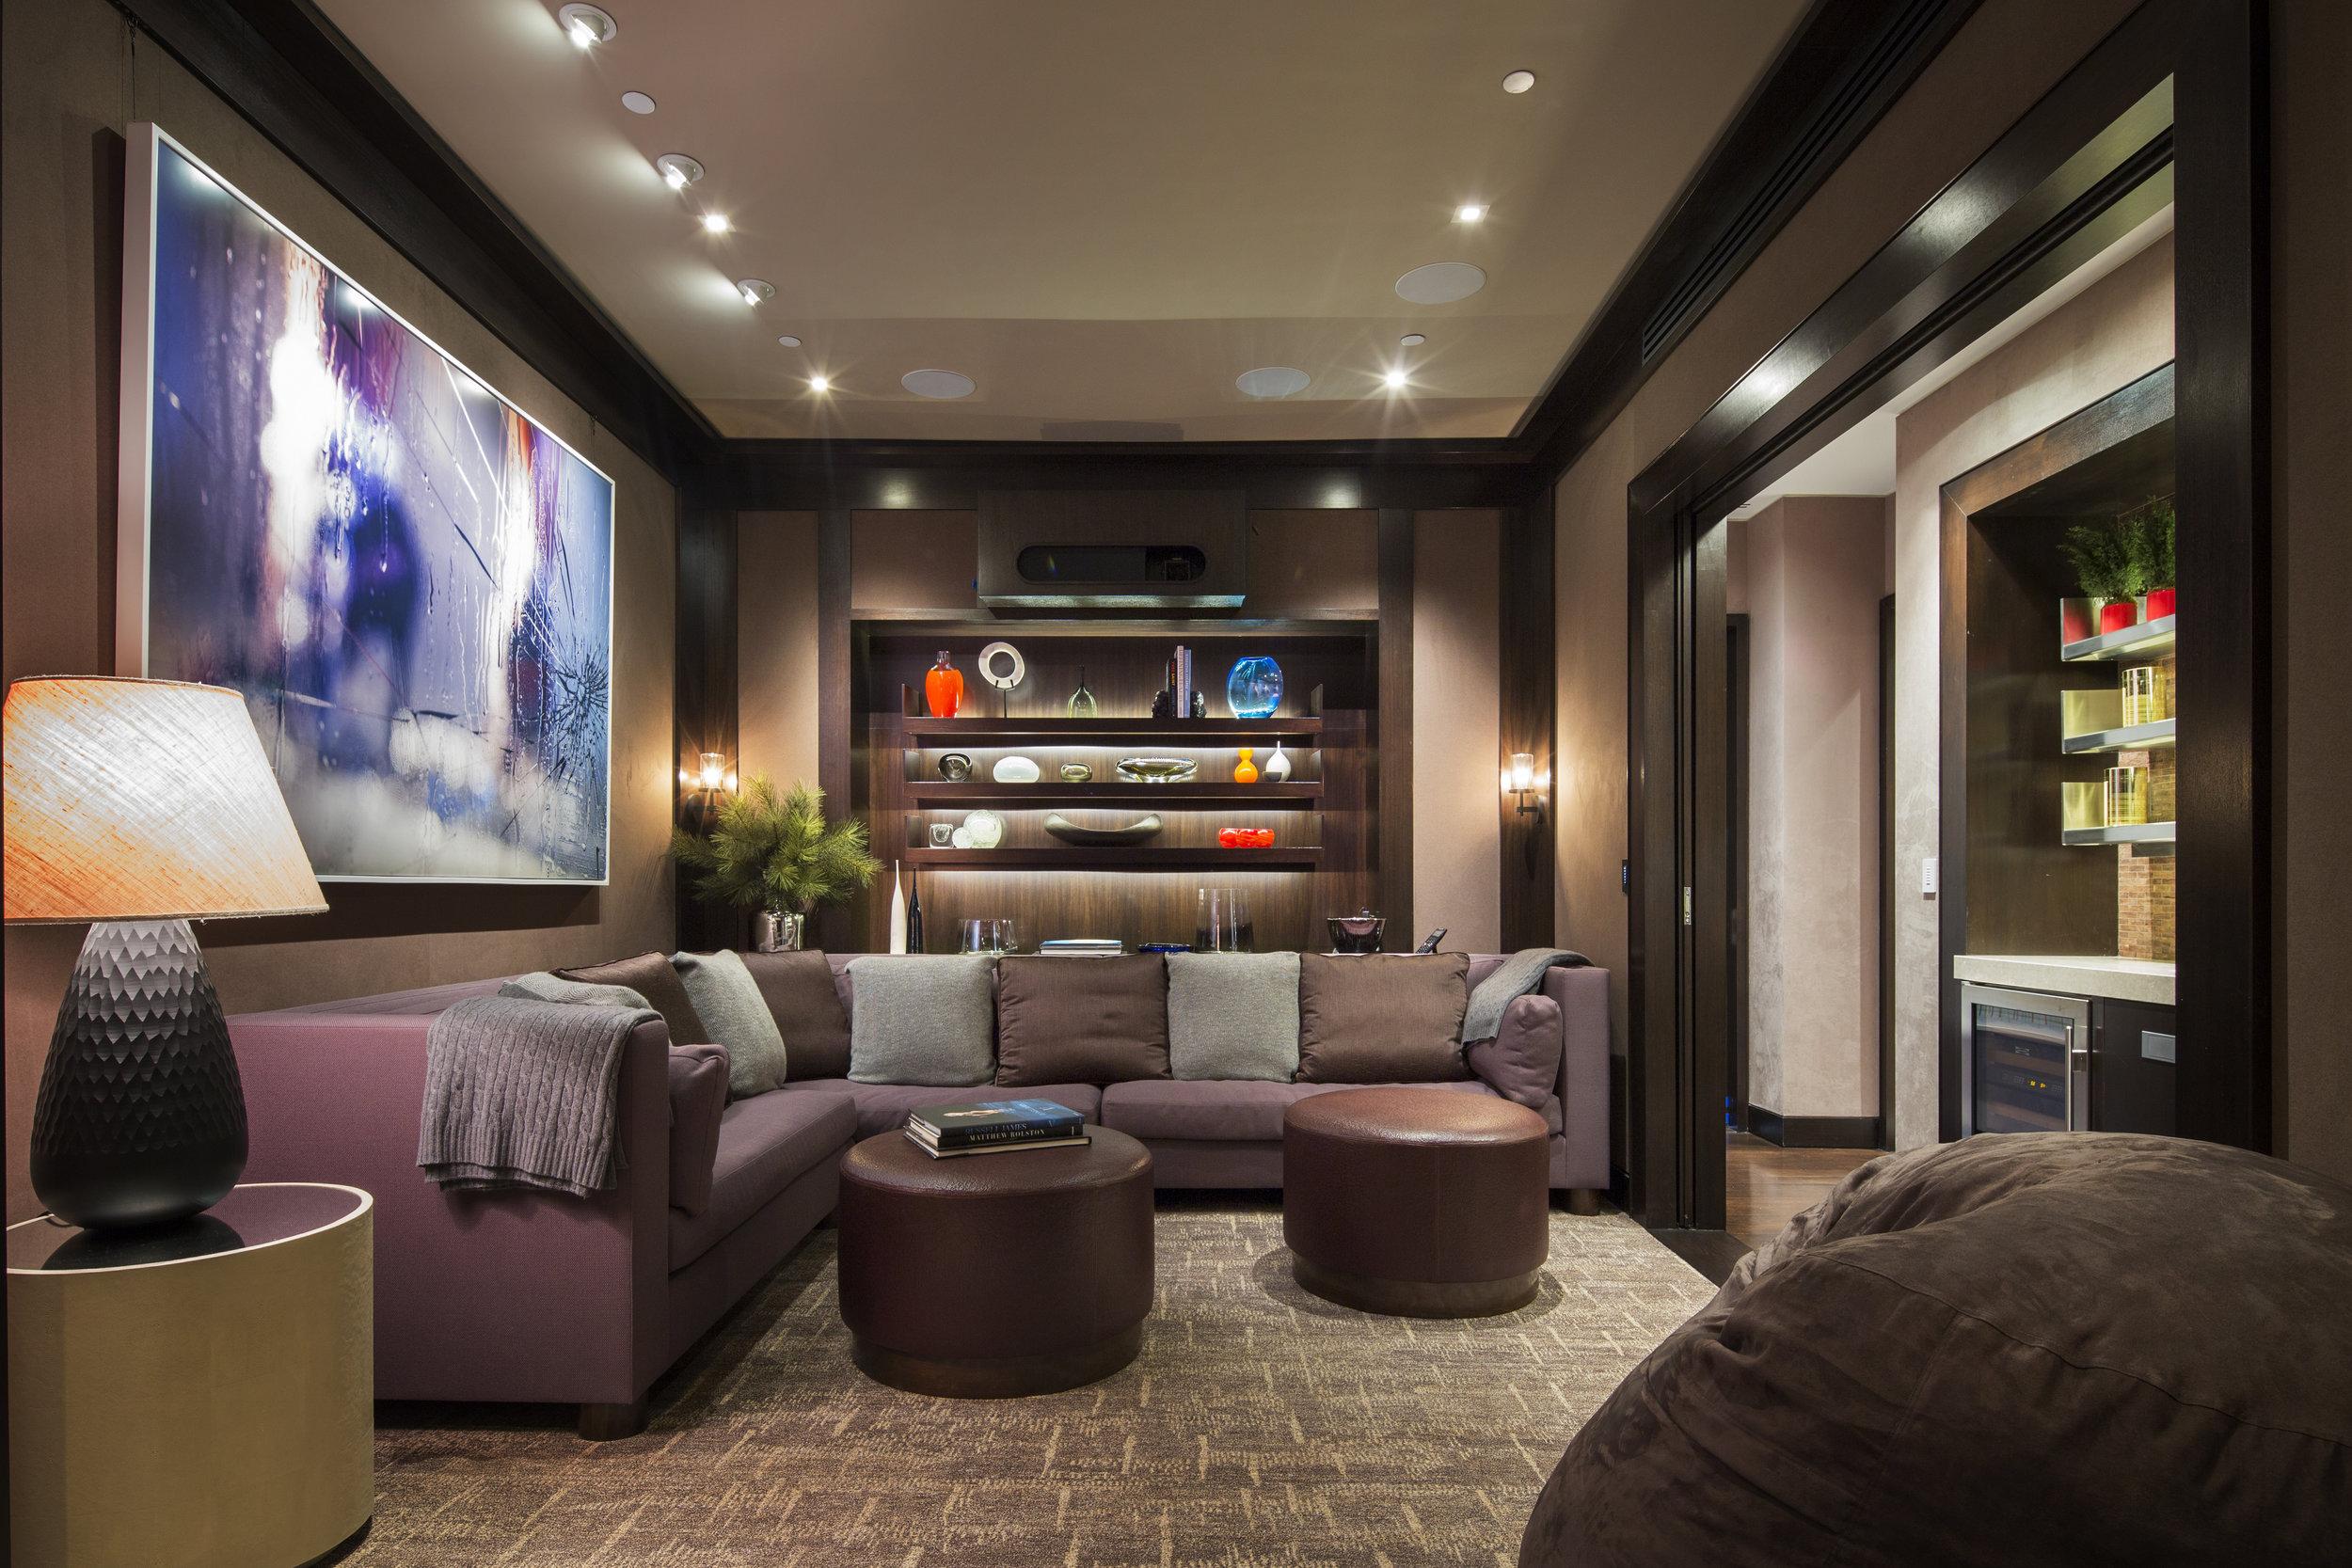 Artist: Marilyn Minter, Interior Design: Campion Platt, Photographer: Scott Frances,Location: New York, New York